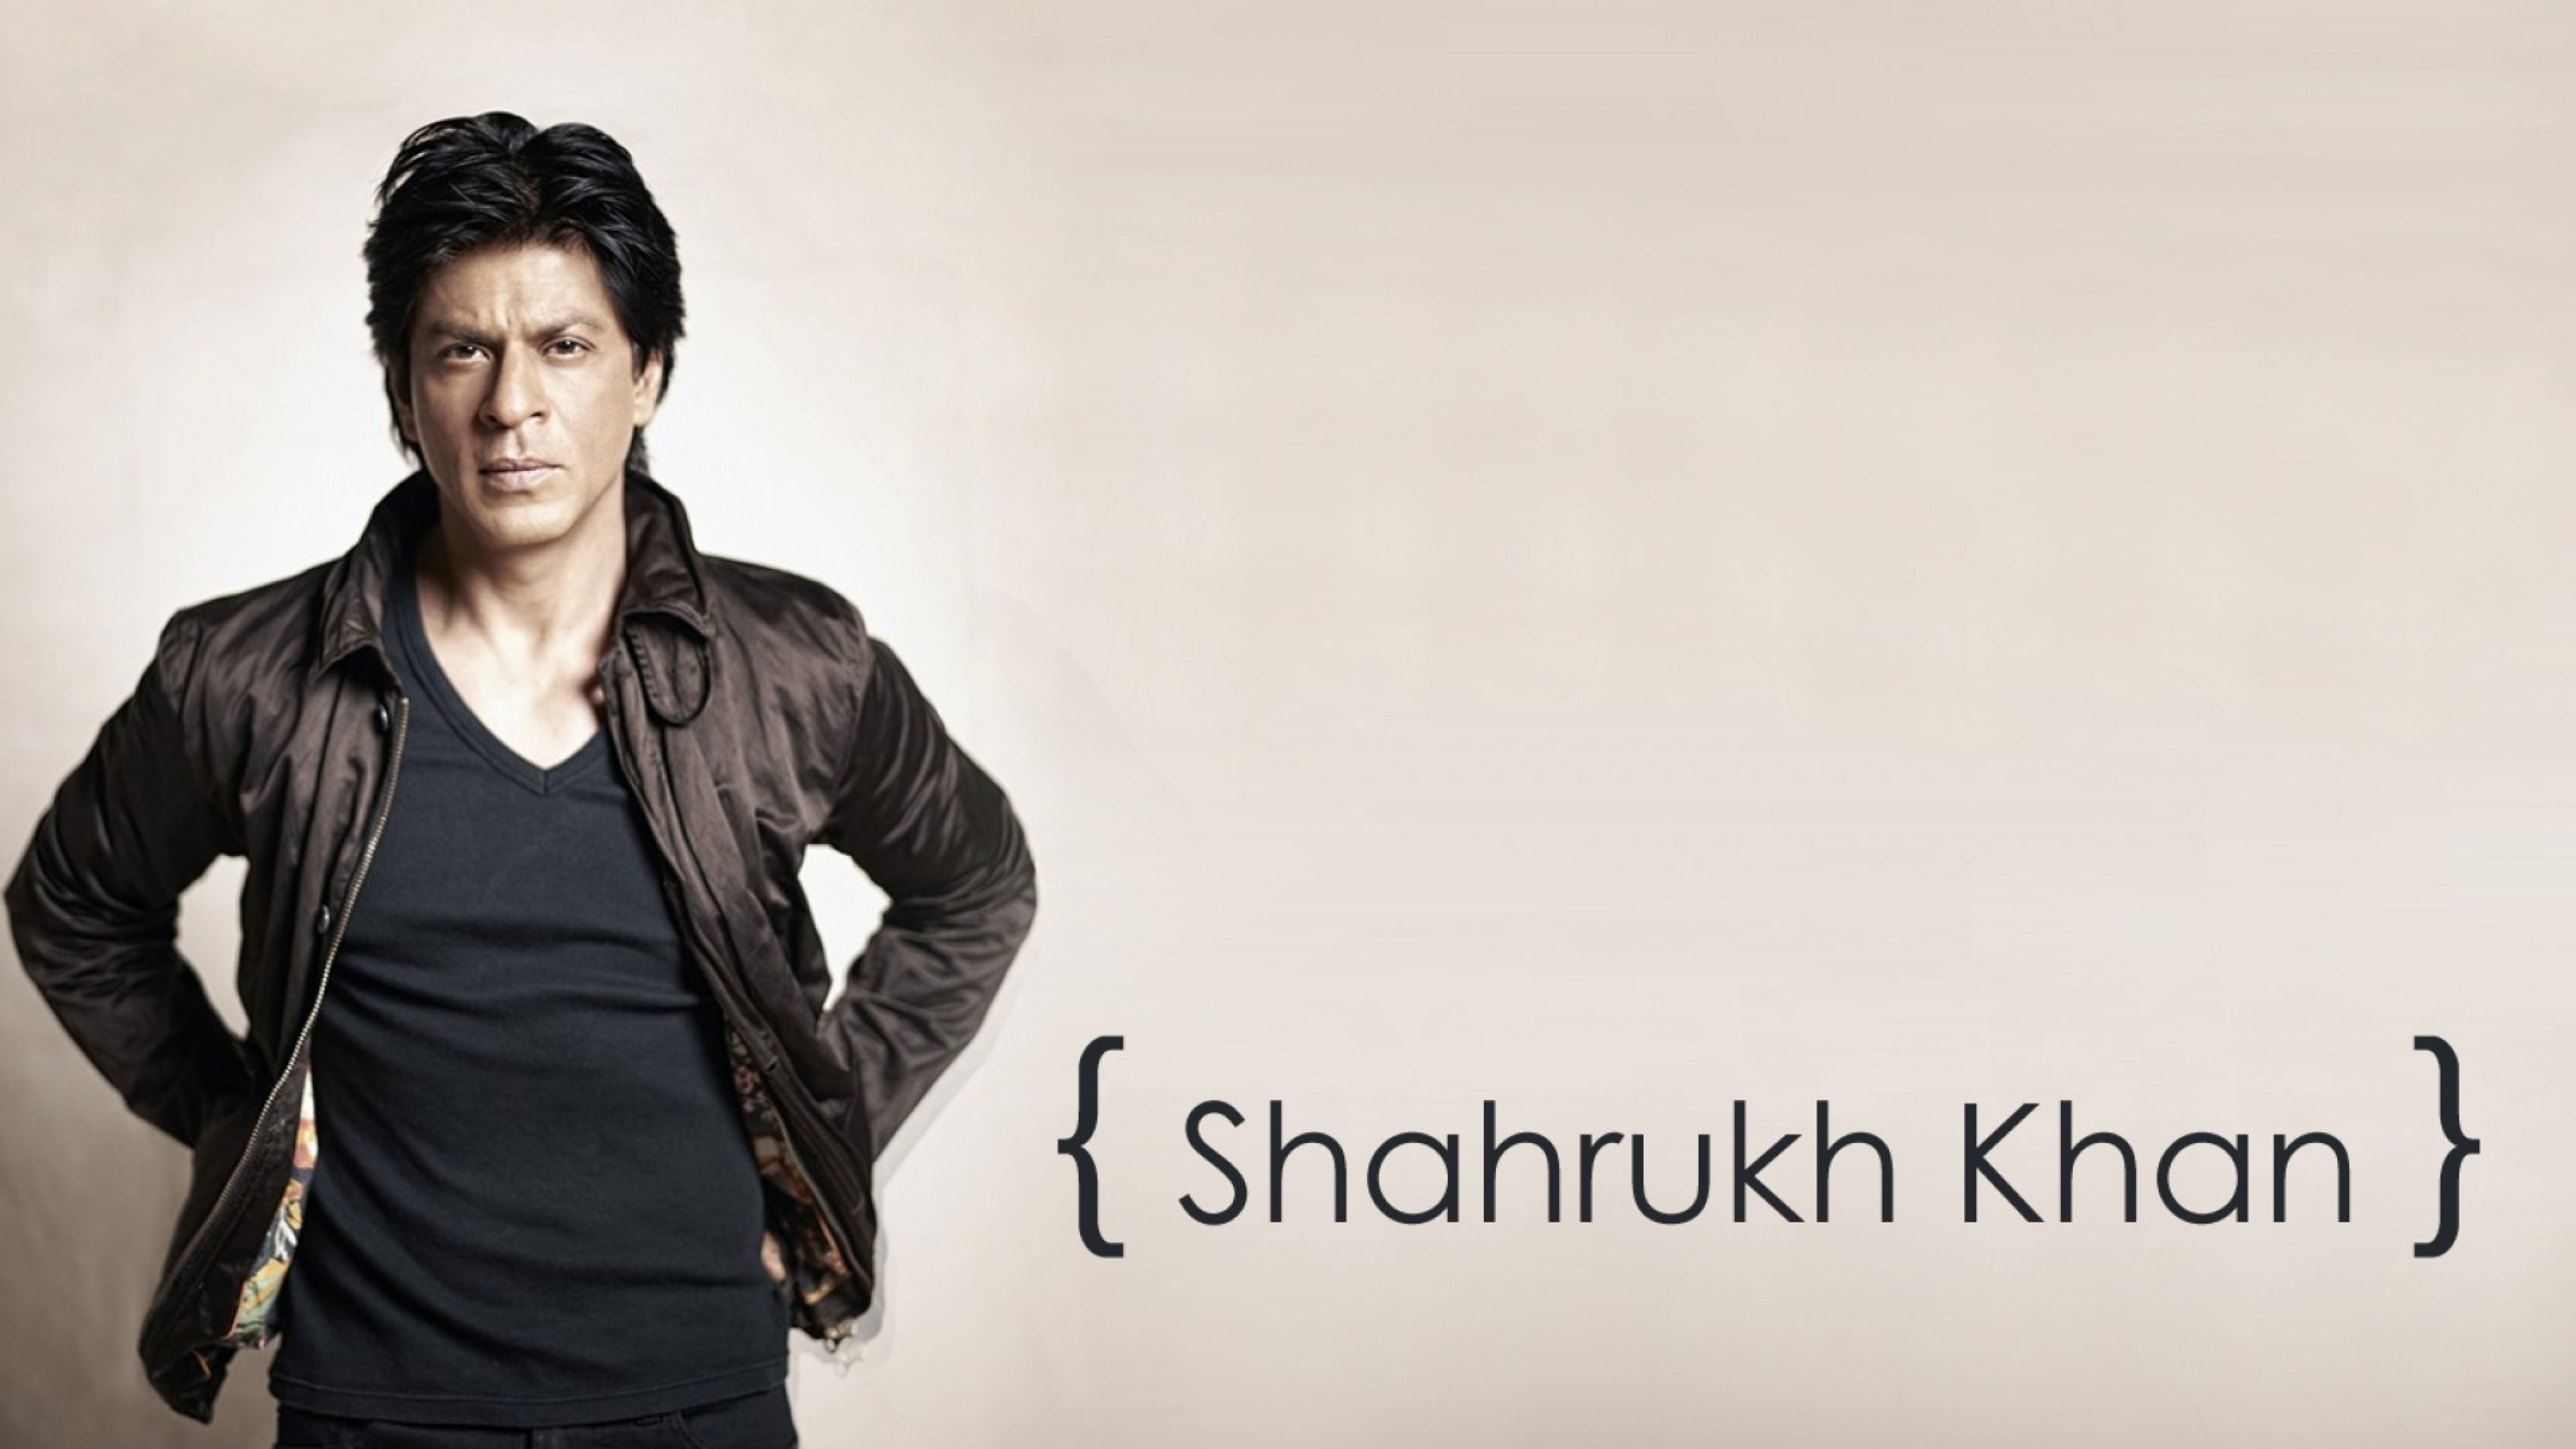 Shah Rukh Khan Photoshoot Full Hd Wallpaper